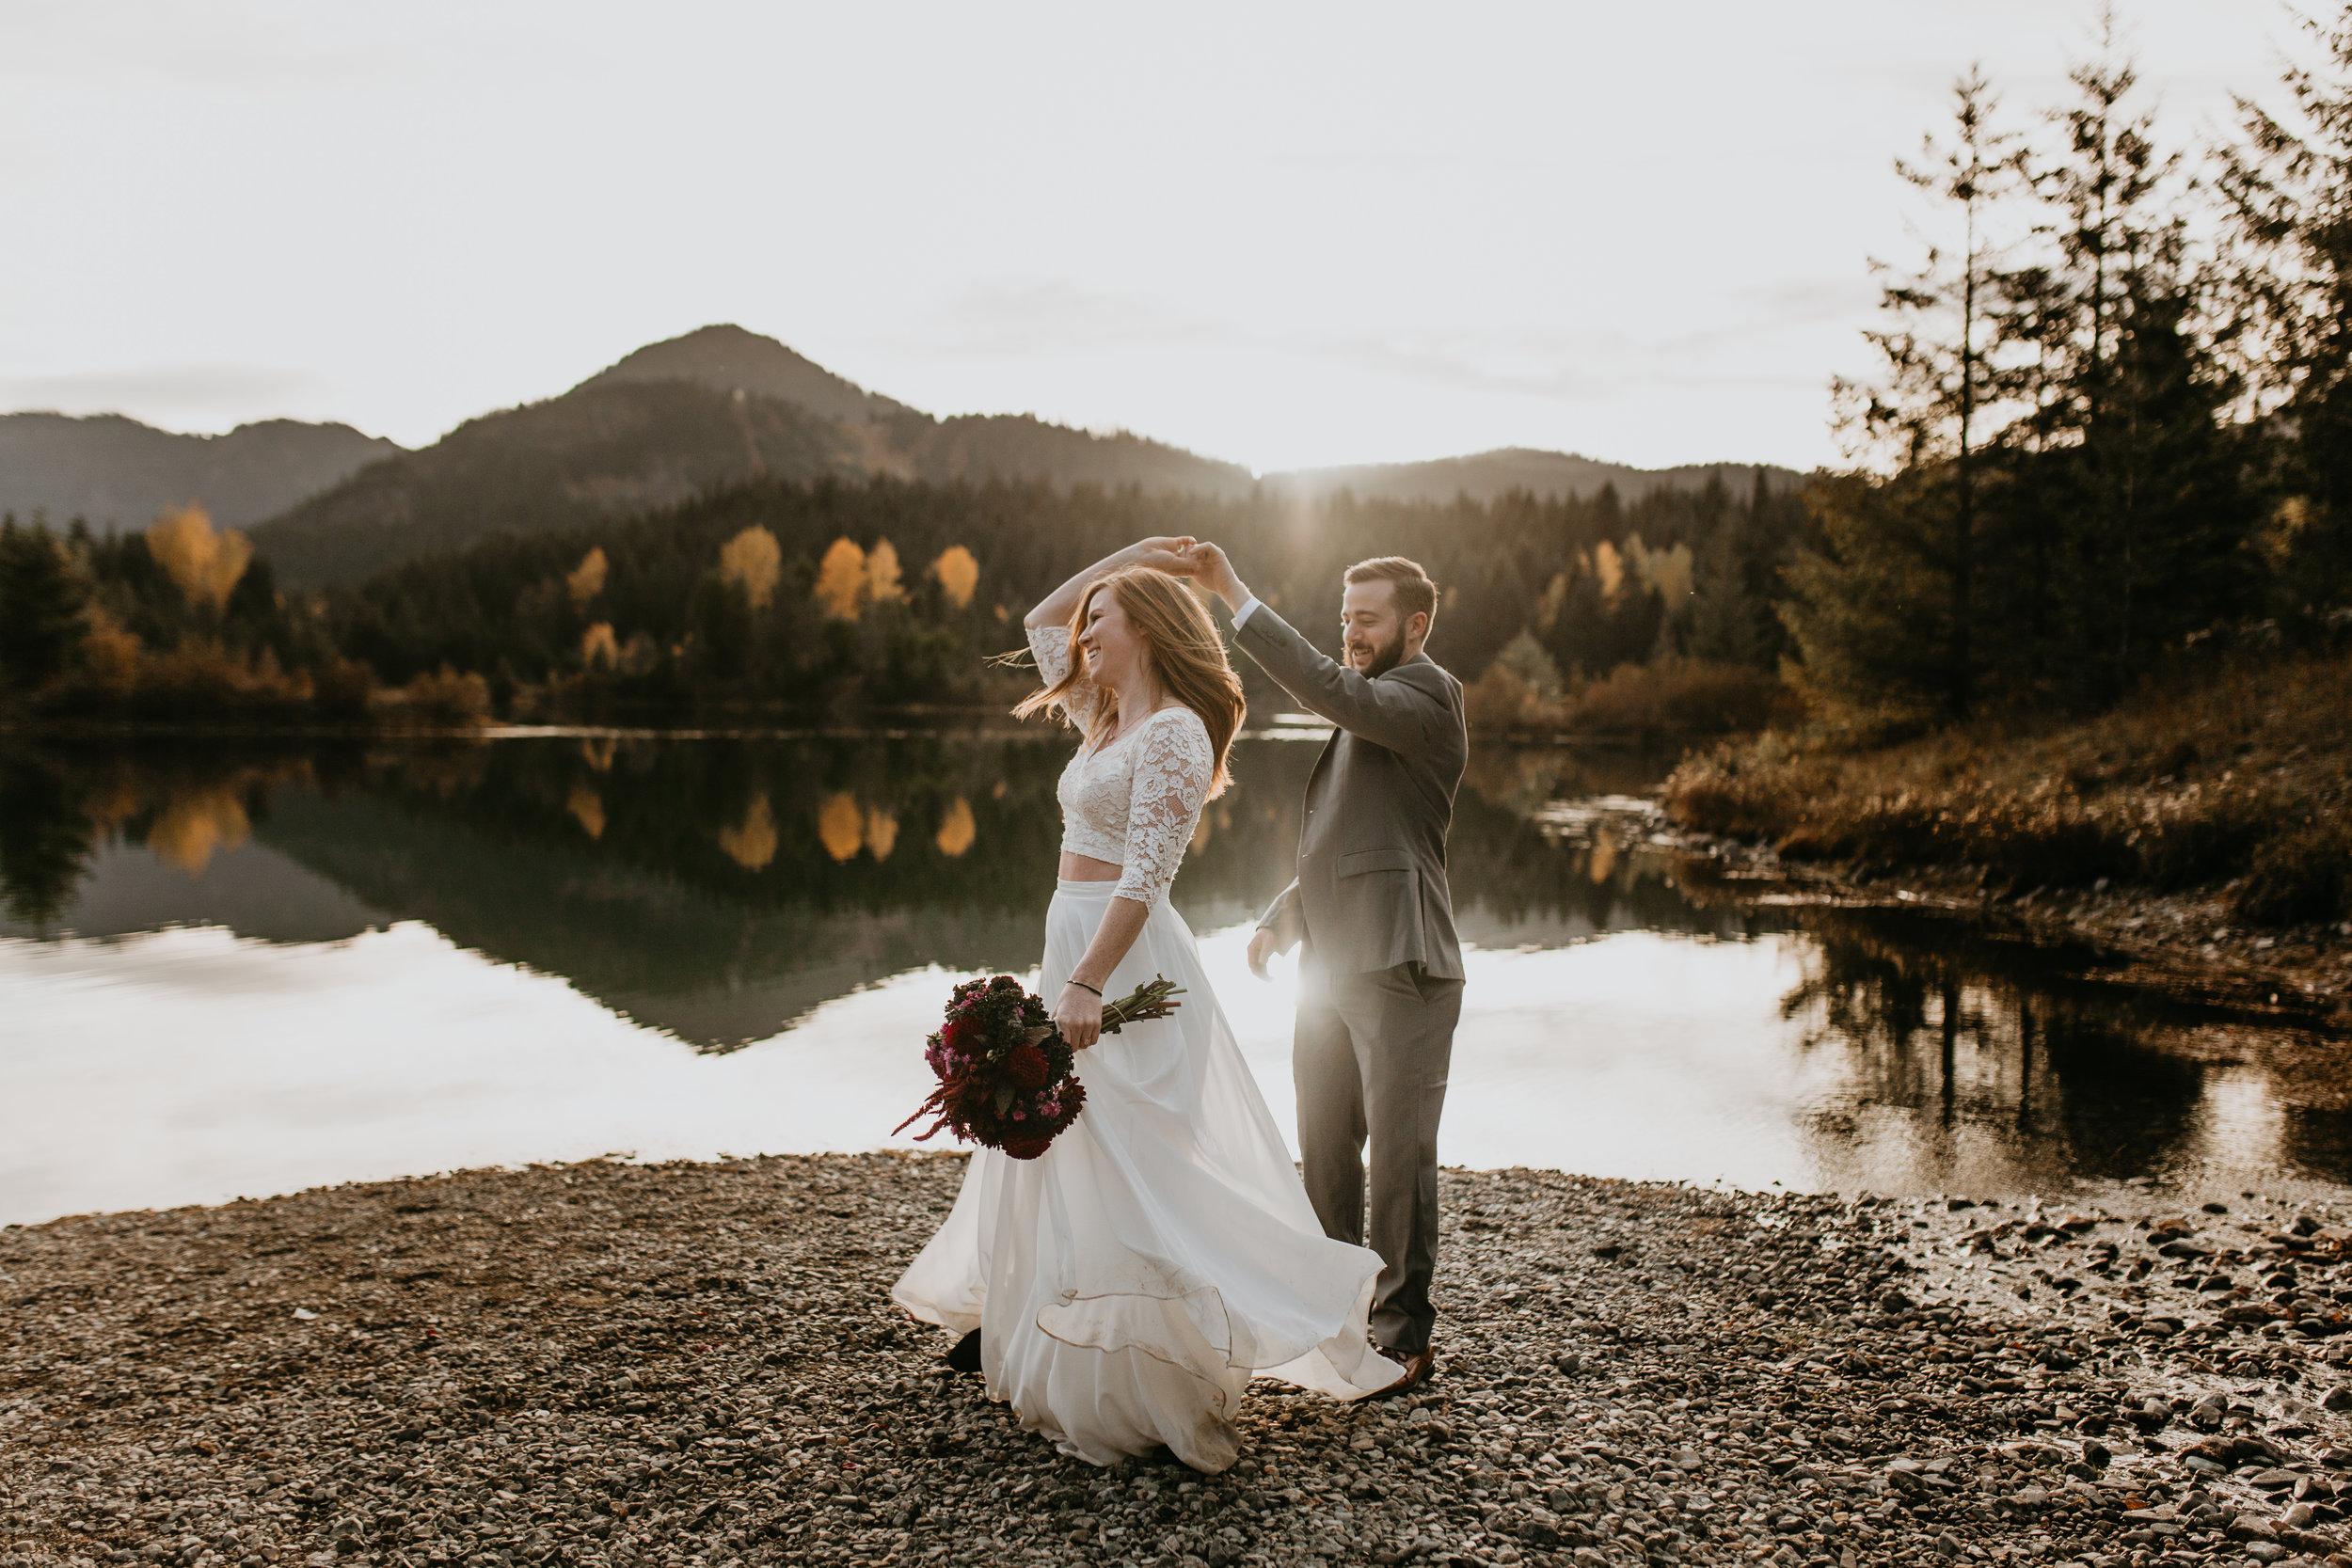 nicole-daacke-photography-mountain-view-elopement-at-gold-creek-pond-snoqualmie-washington-wa-elopement-photographer-photography-adventure-elopement-in-washington-fall-lakeside-golden-sunset-boho-fun-bride-0409.jpg